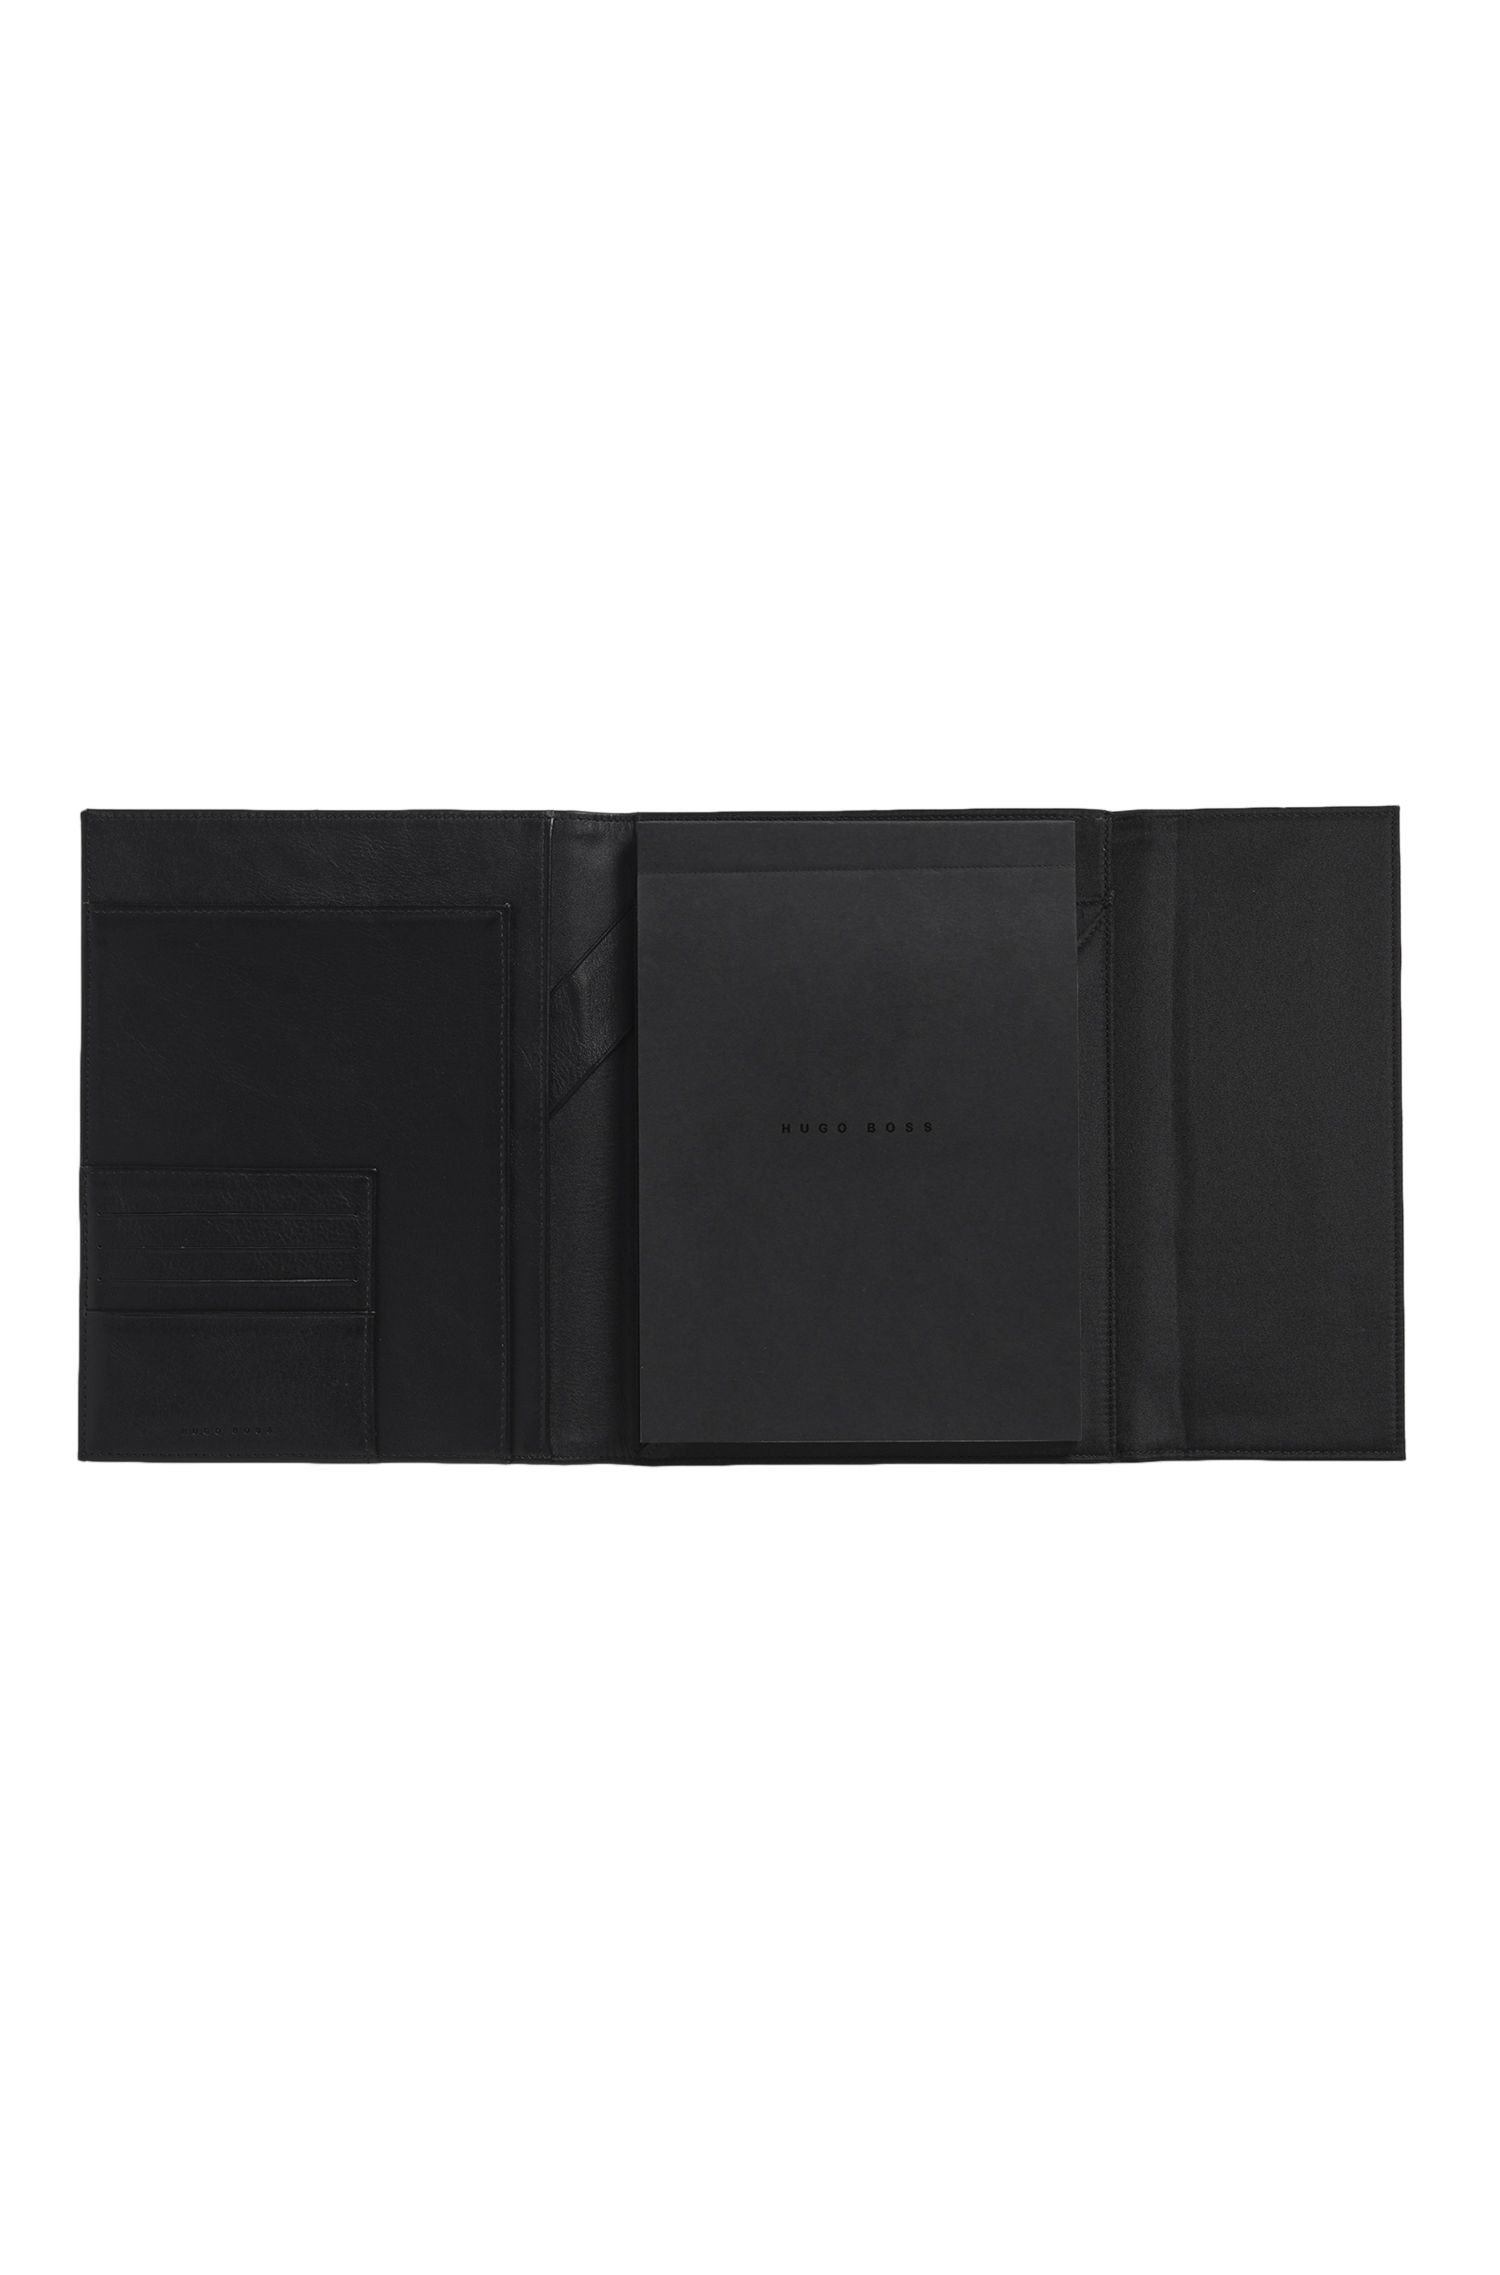 Leather A4 Portfolio with Notepad | Conference Folder A5 Caption Contrast BI